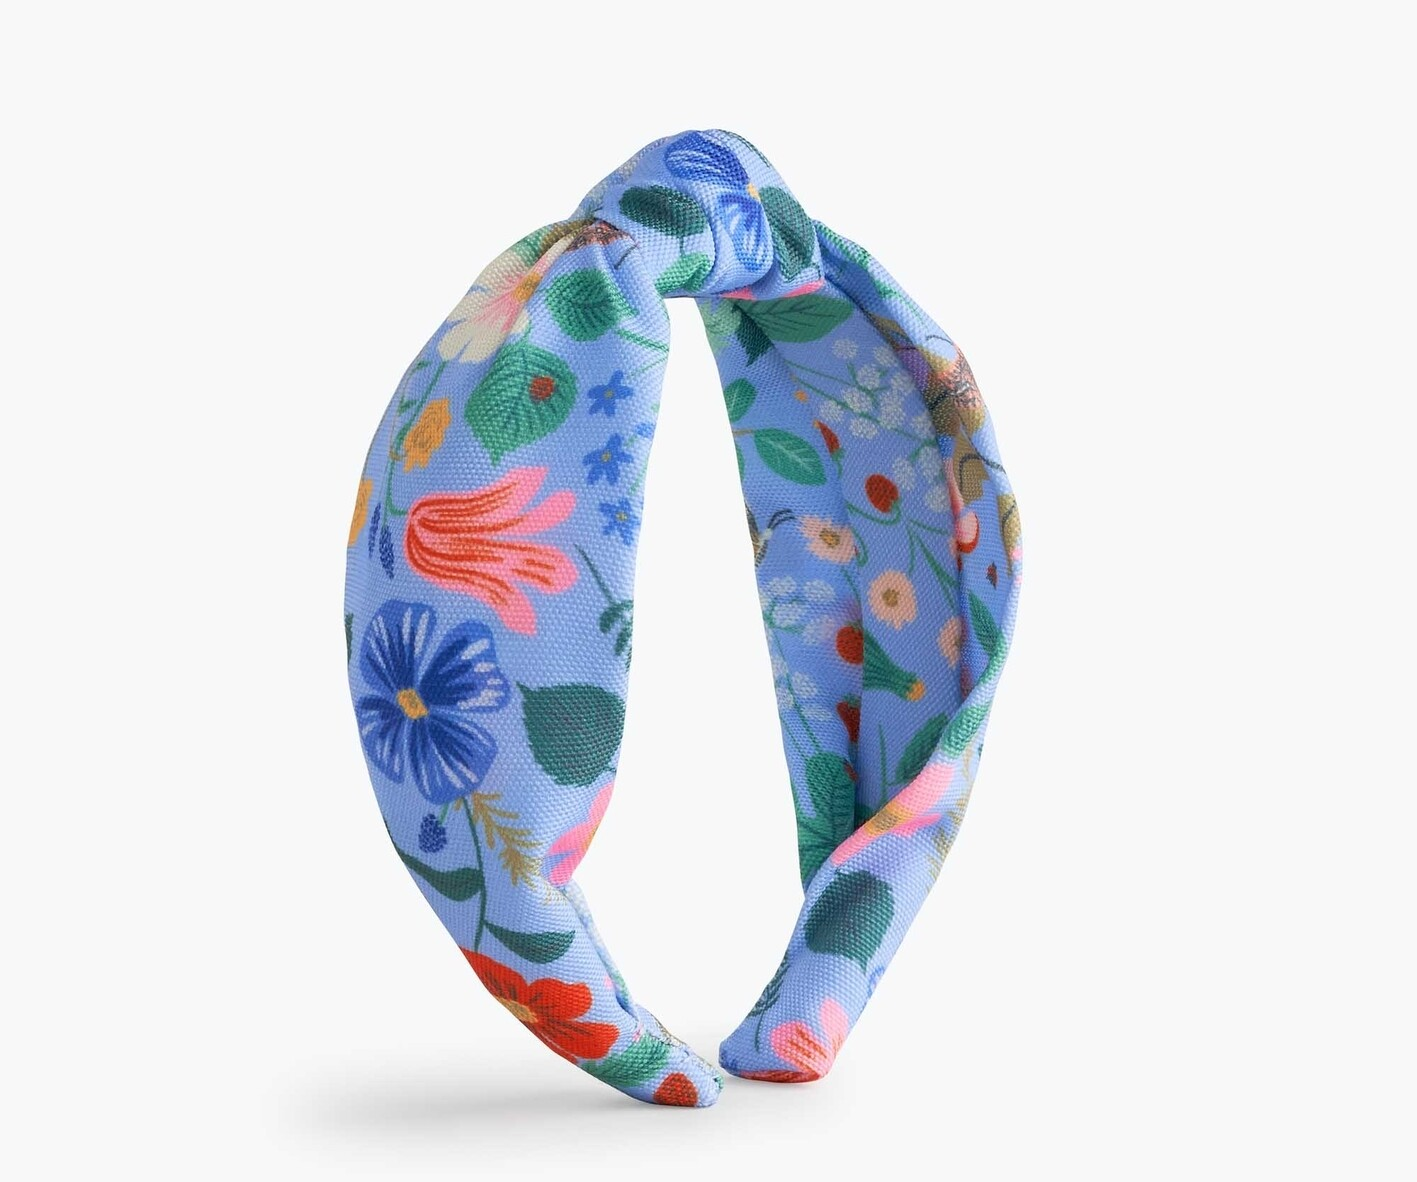 Knotted Headband - Strawberry Fields